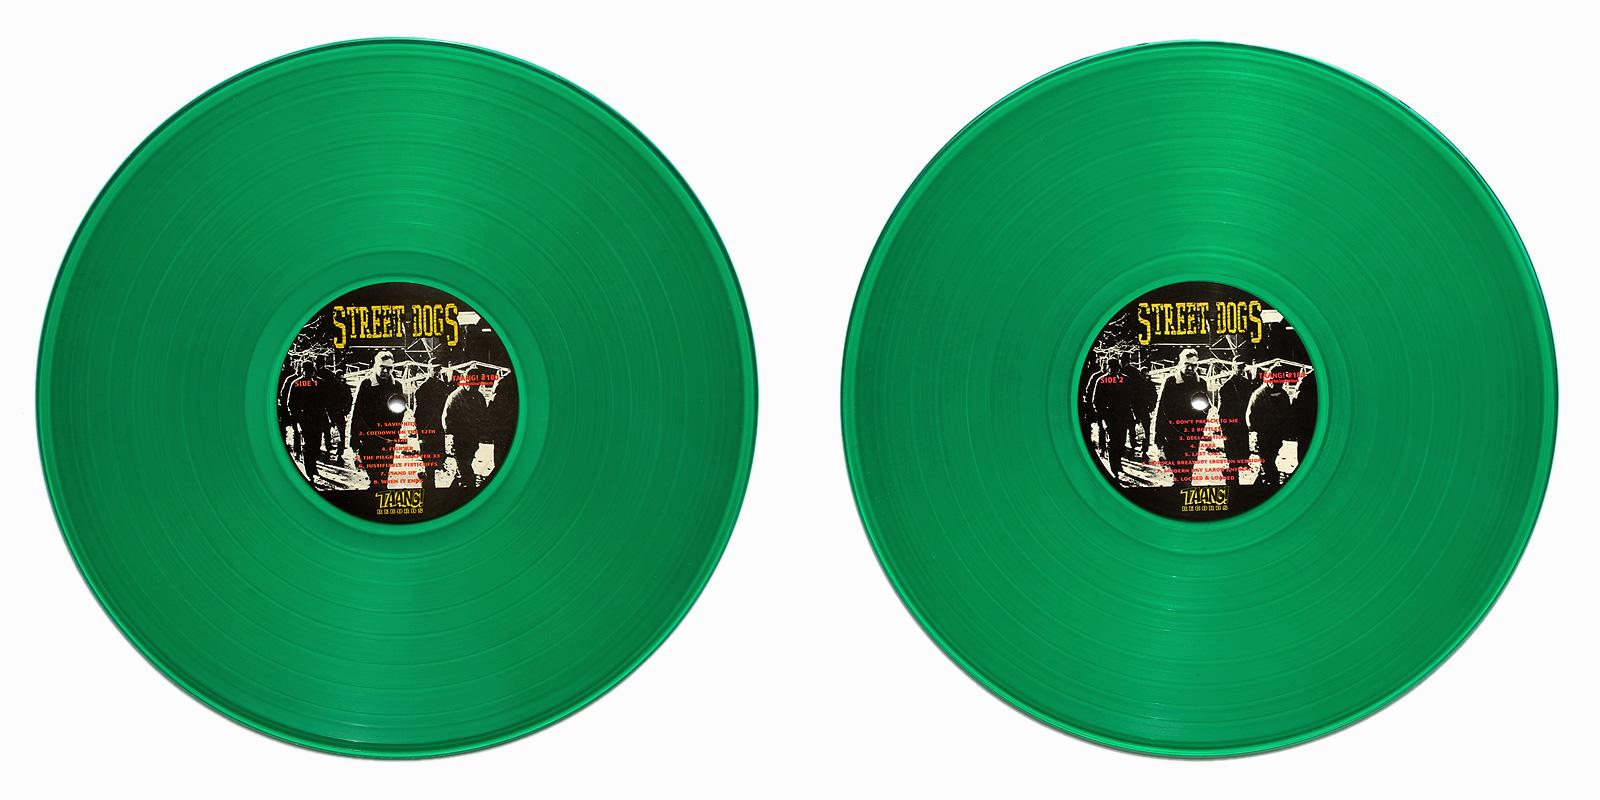 Street Dogs Punk Vinyl Collector